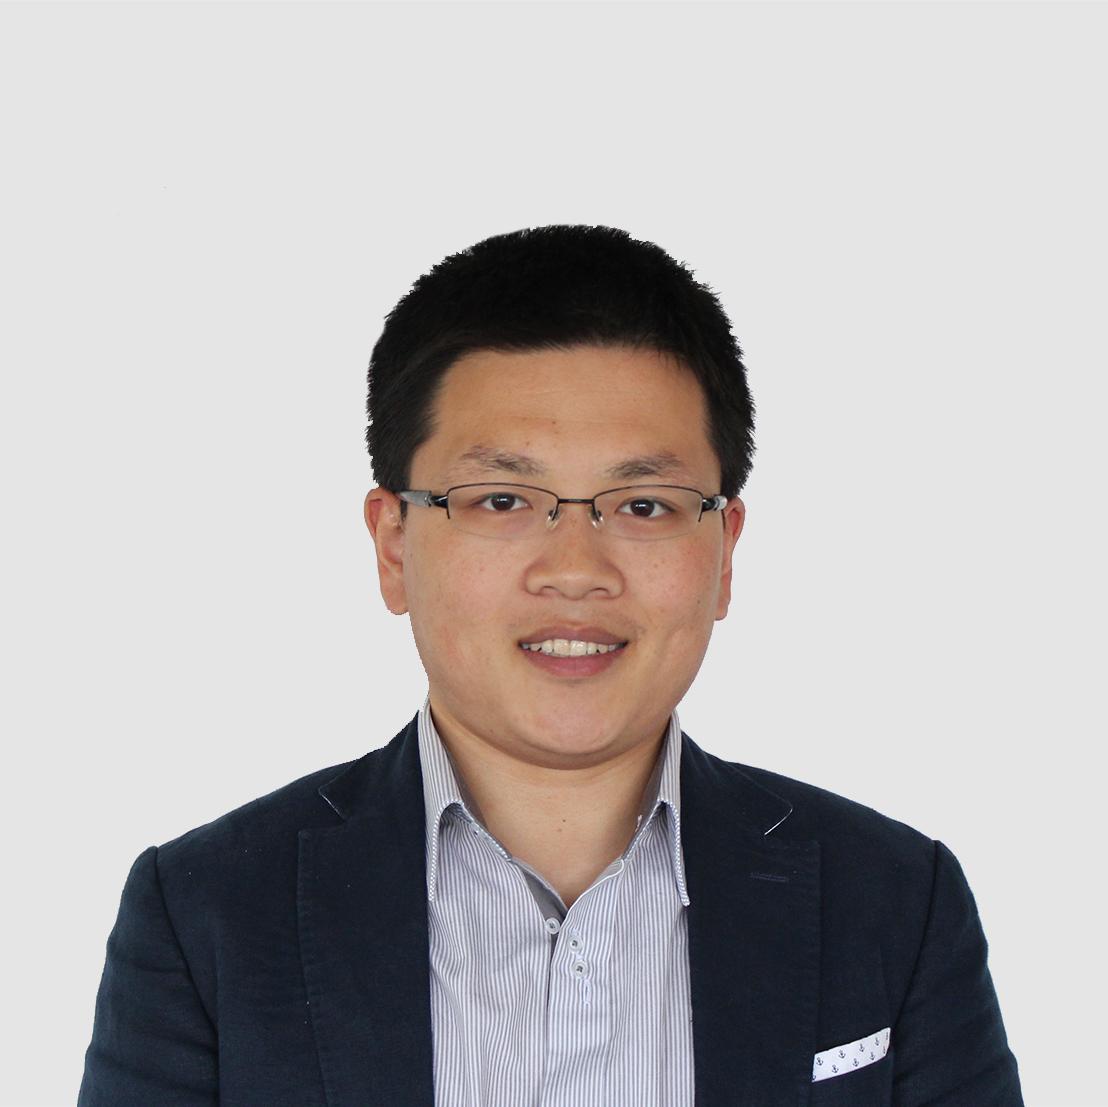 Guanghui Li